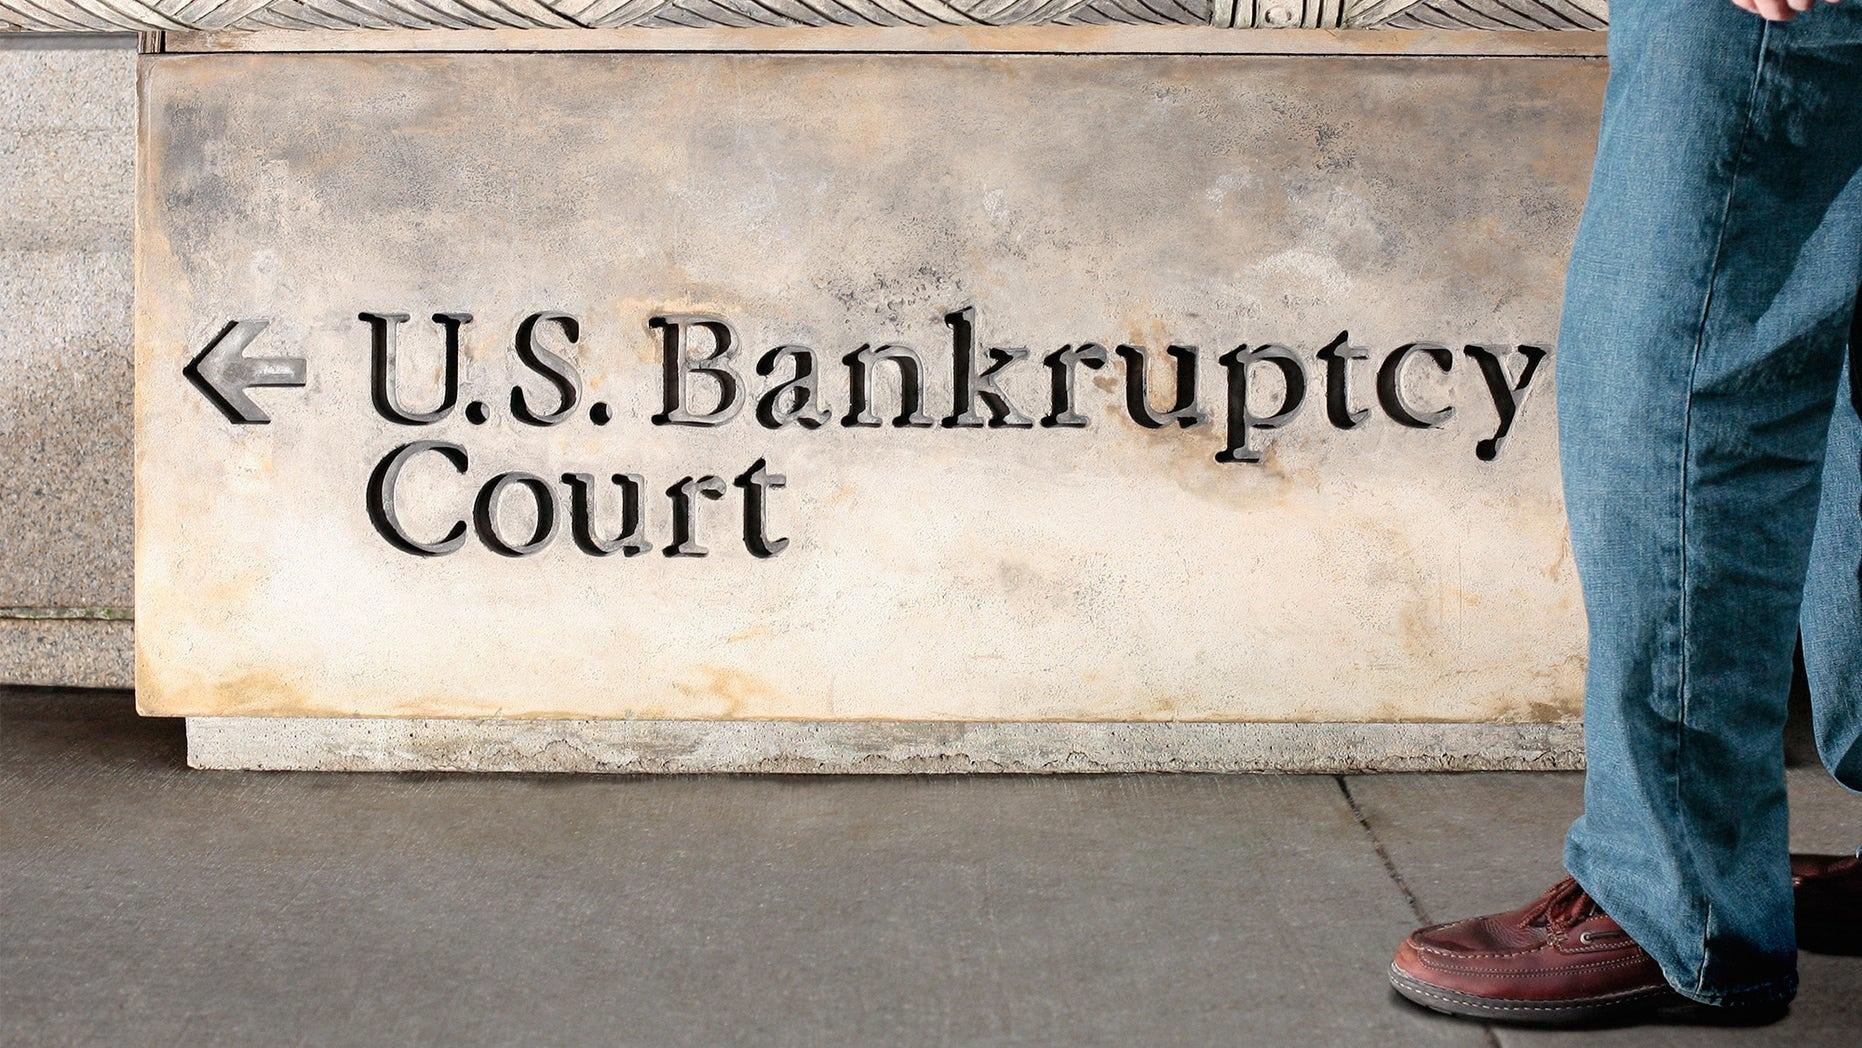 U.S. bankruptcy court sign